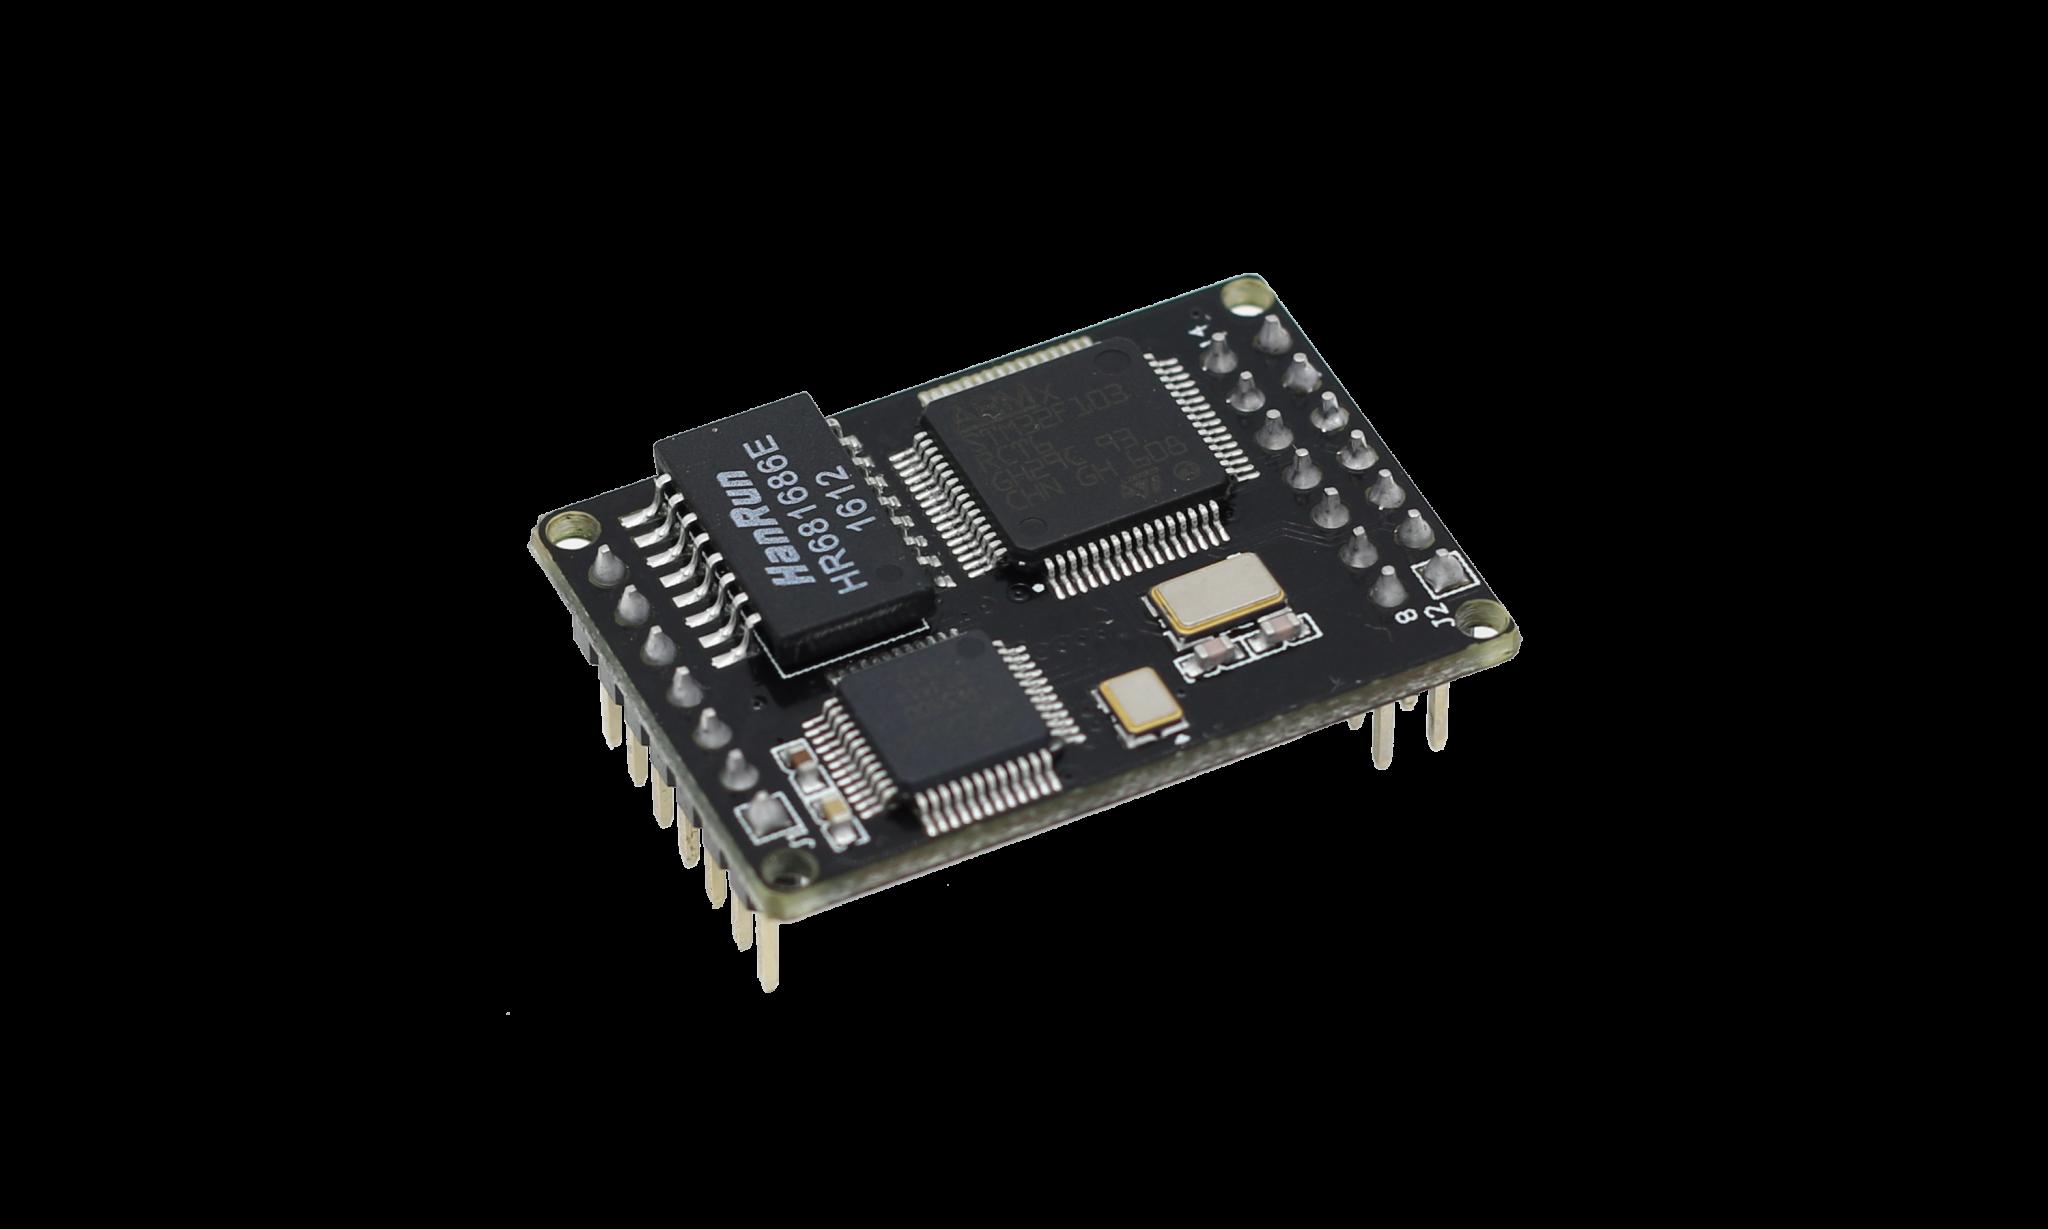 WIZnet HK 推出高性能串口转以太网模块:W5500S2E-S1